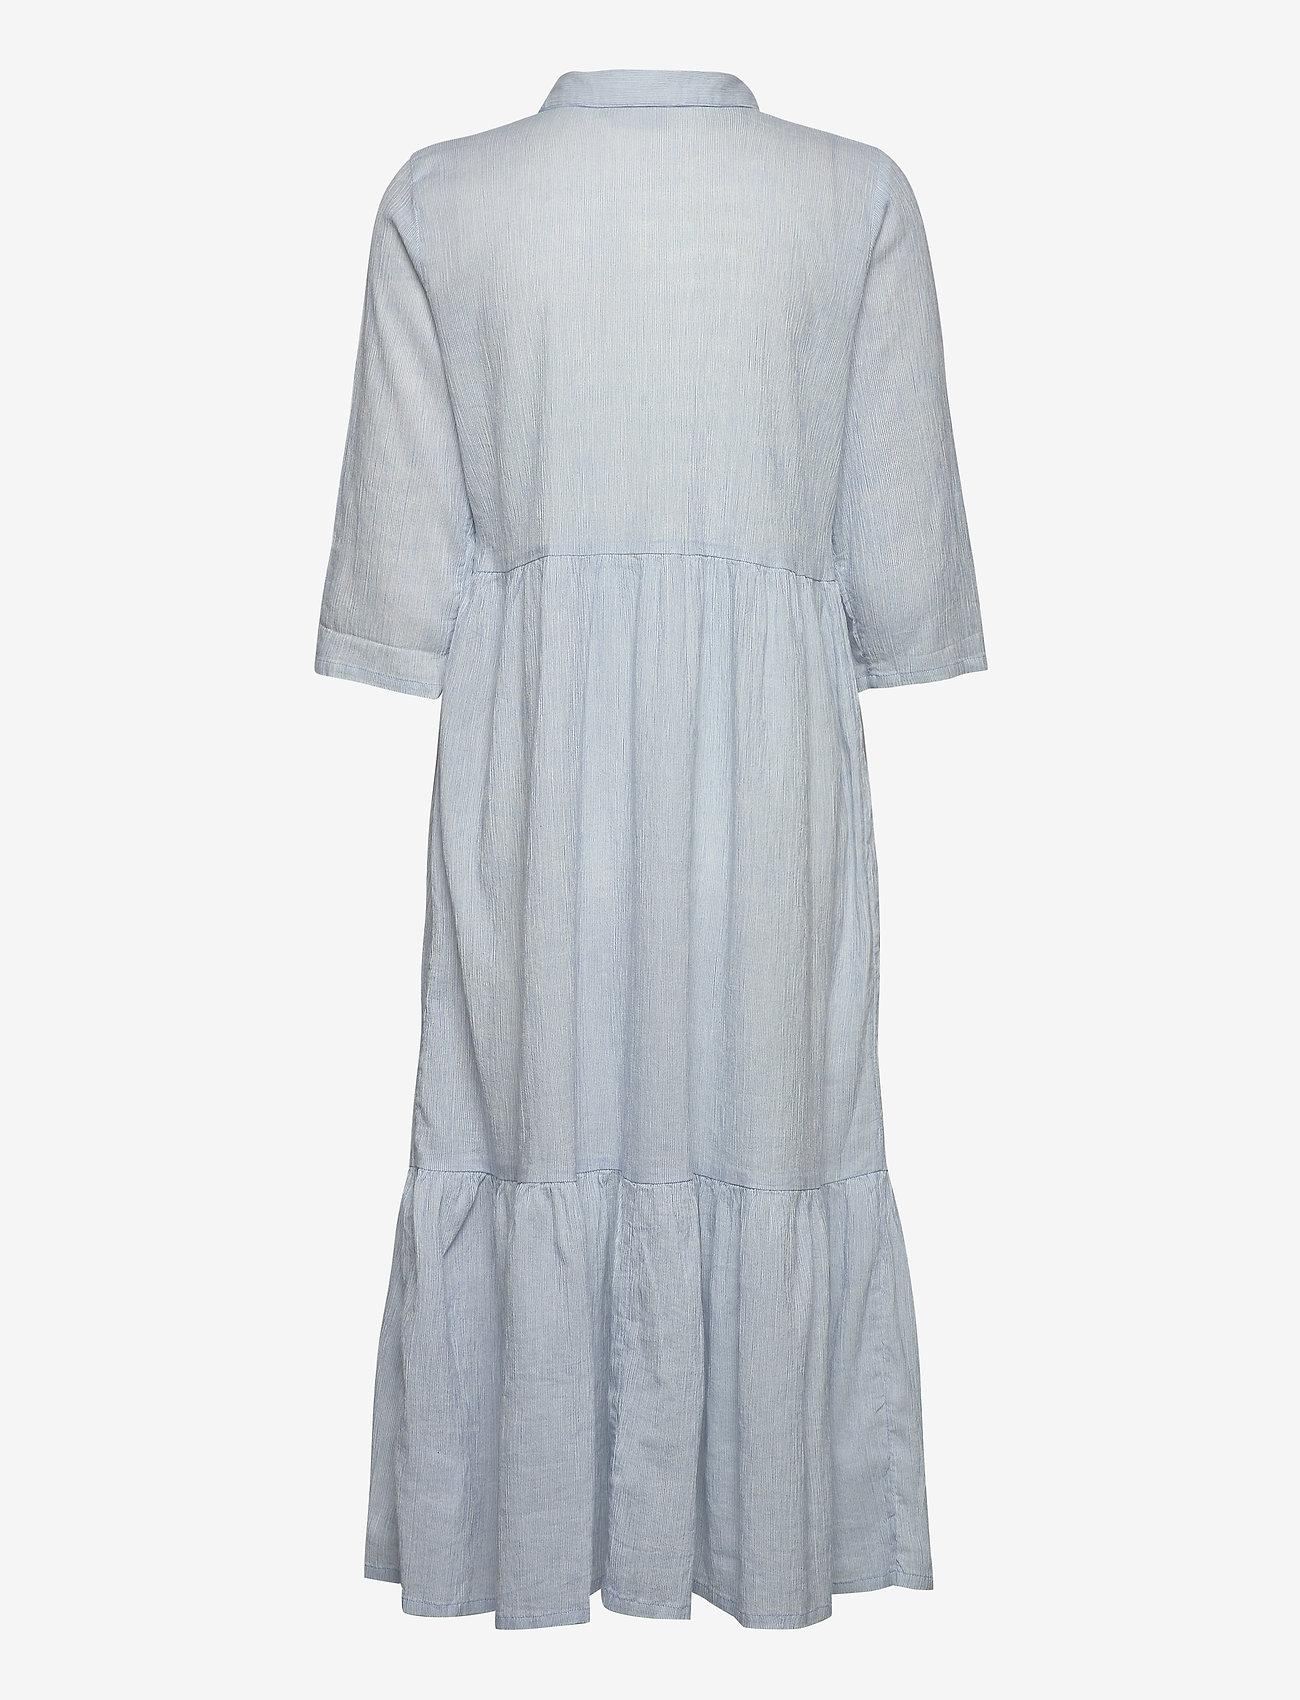 Kavivian Dress (Placid Blue) - Kaffe Wjyvq3